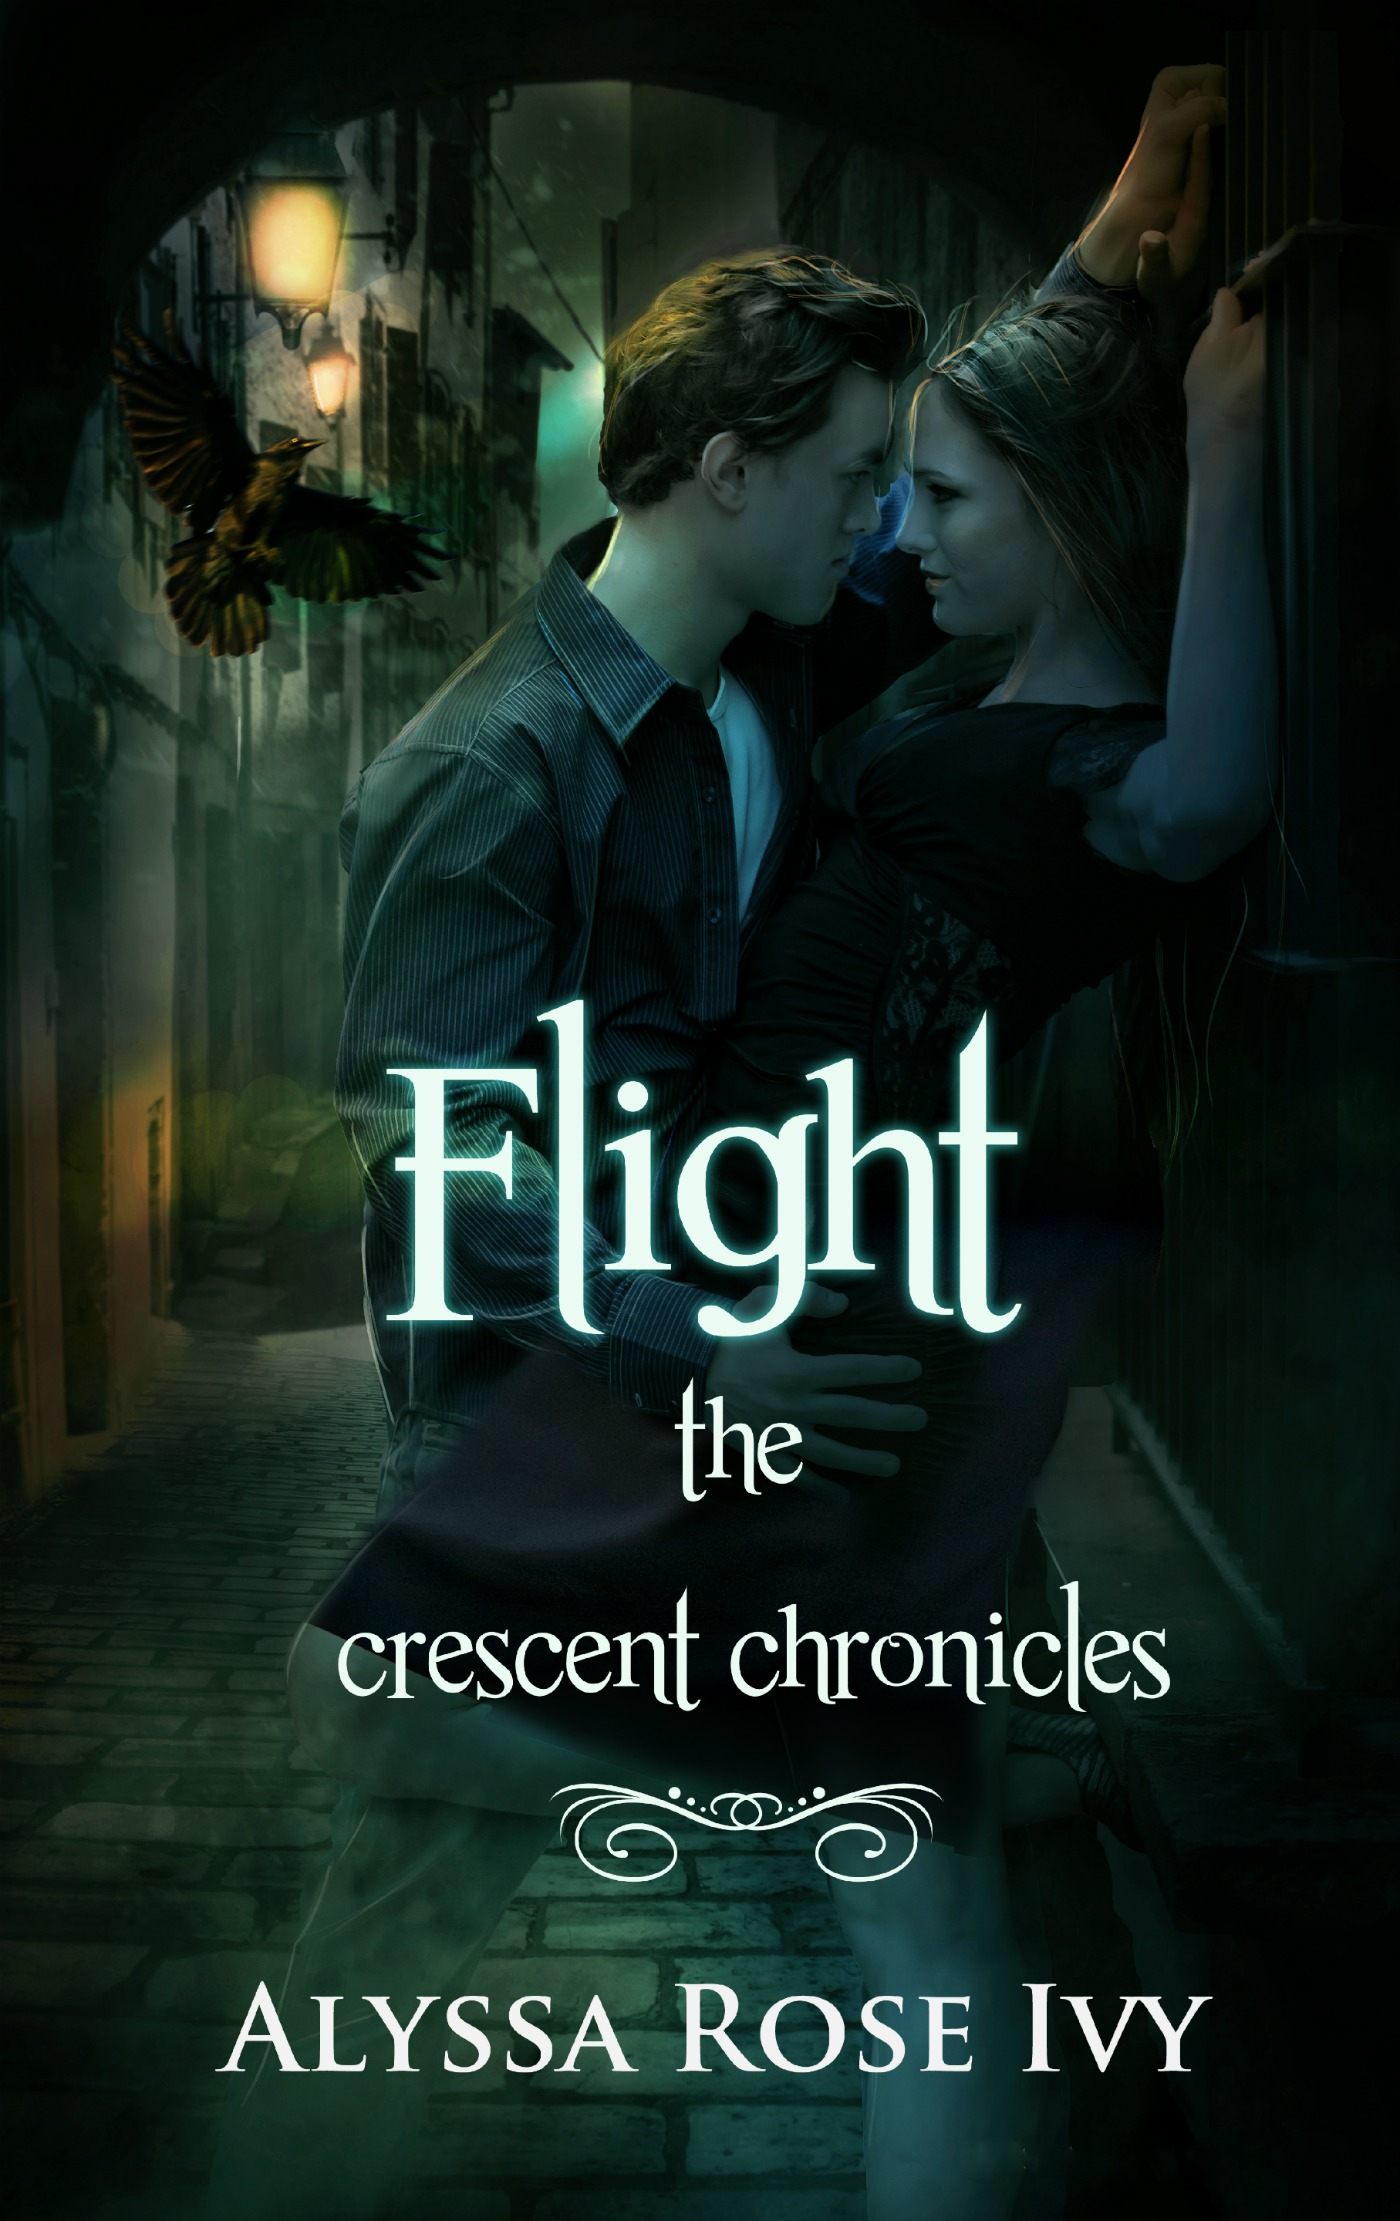 Flight (sst-ccclxxvii)